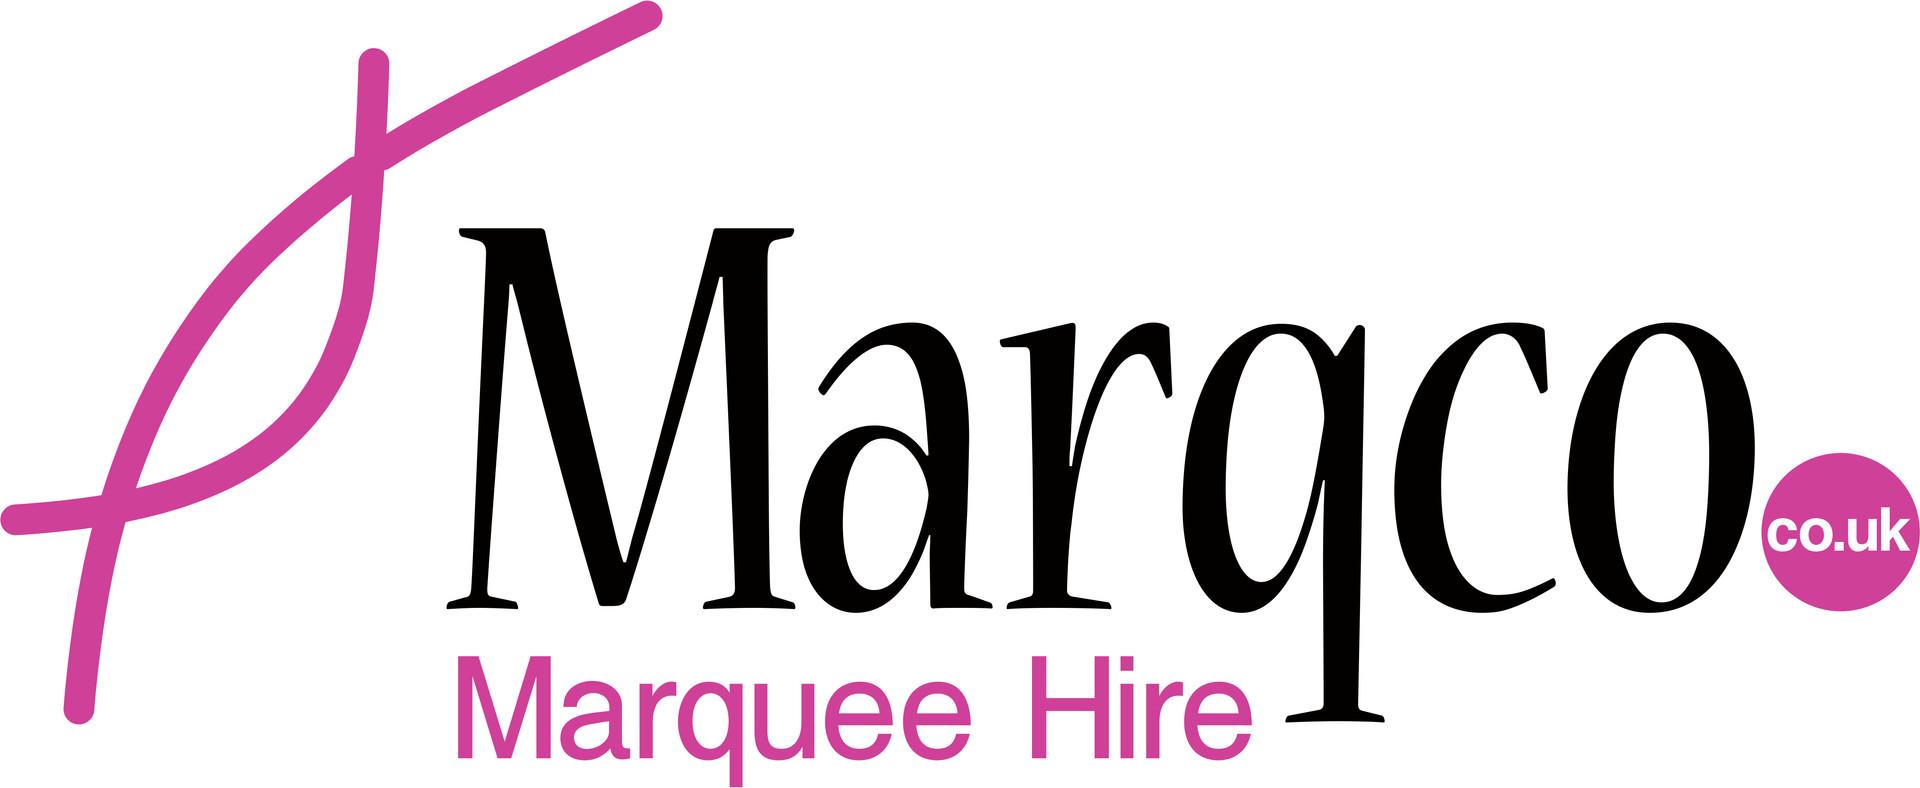 MARQCO logo New 2  (2).jpg